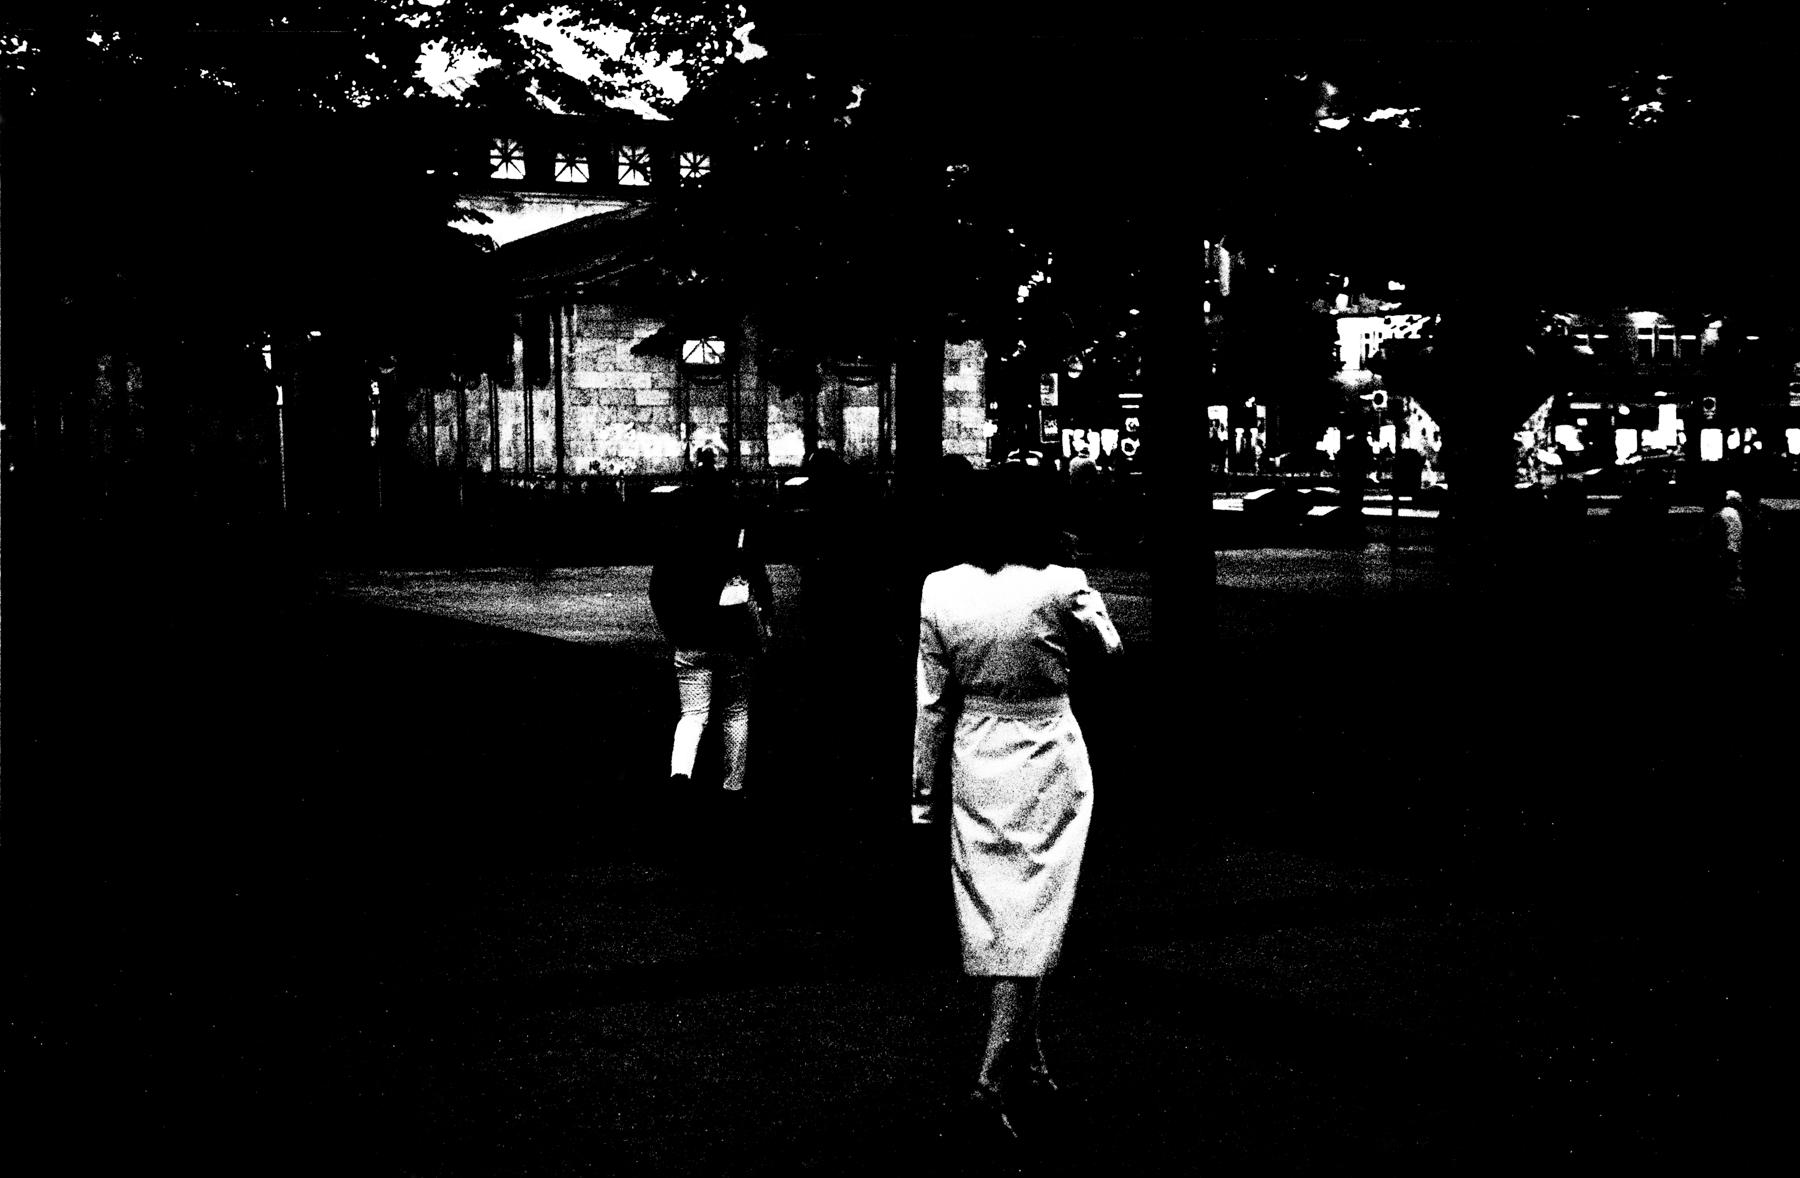 Leica - Hamburg Juni. Analog Leica Berlin#. 33.jpg